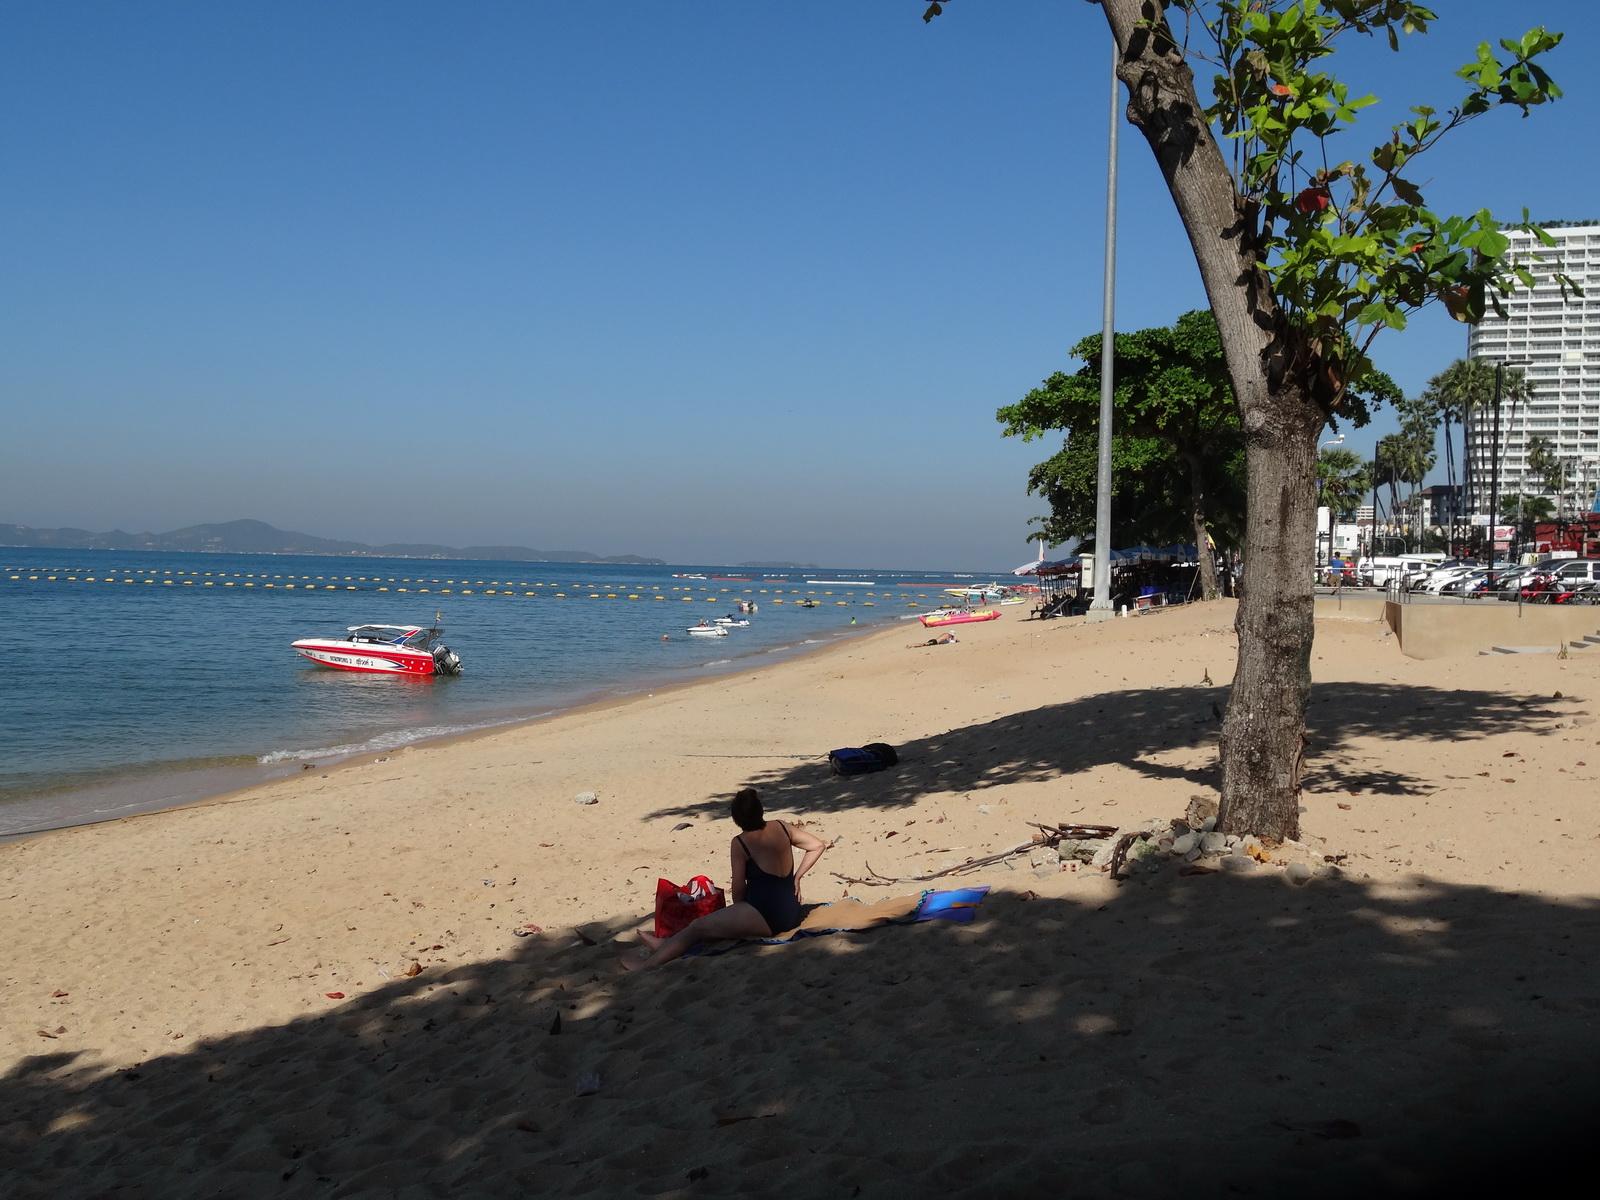 07 Pattaya 009